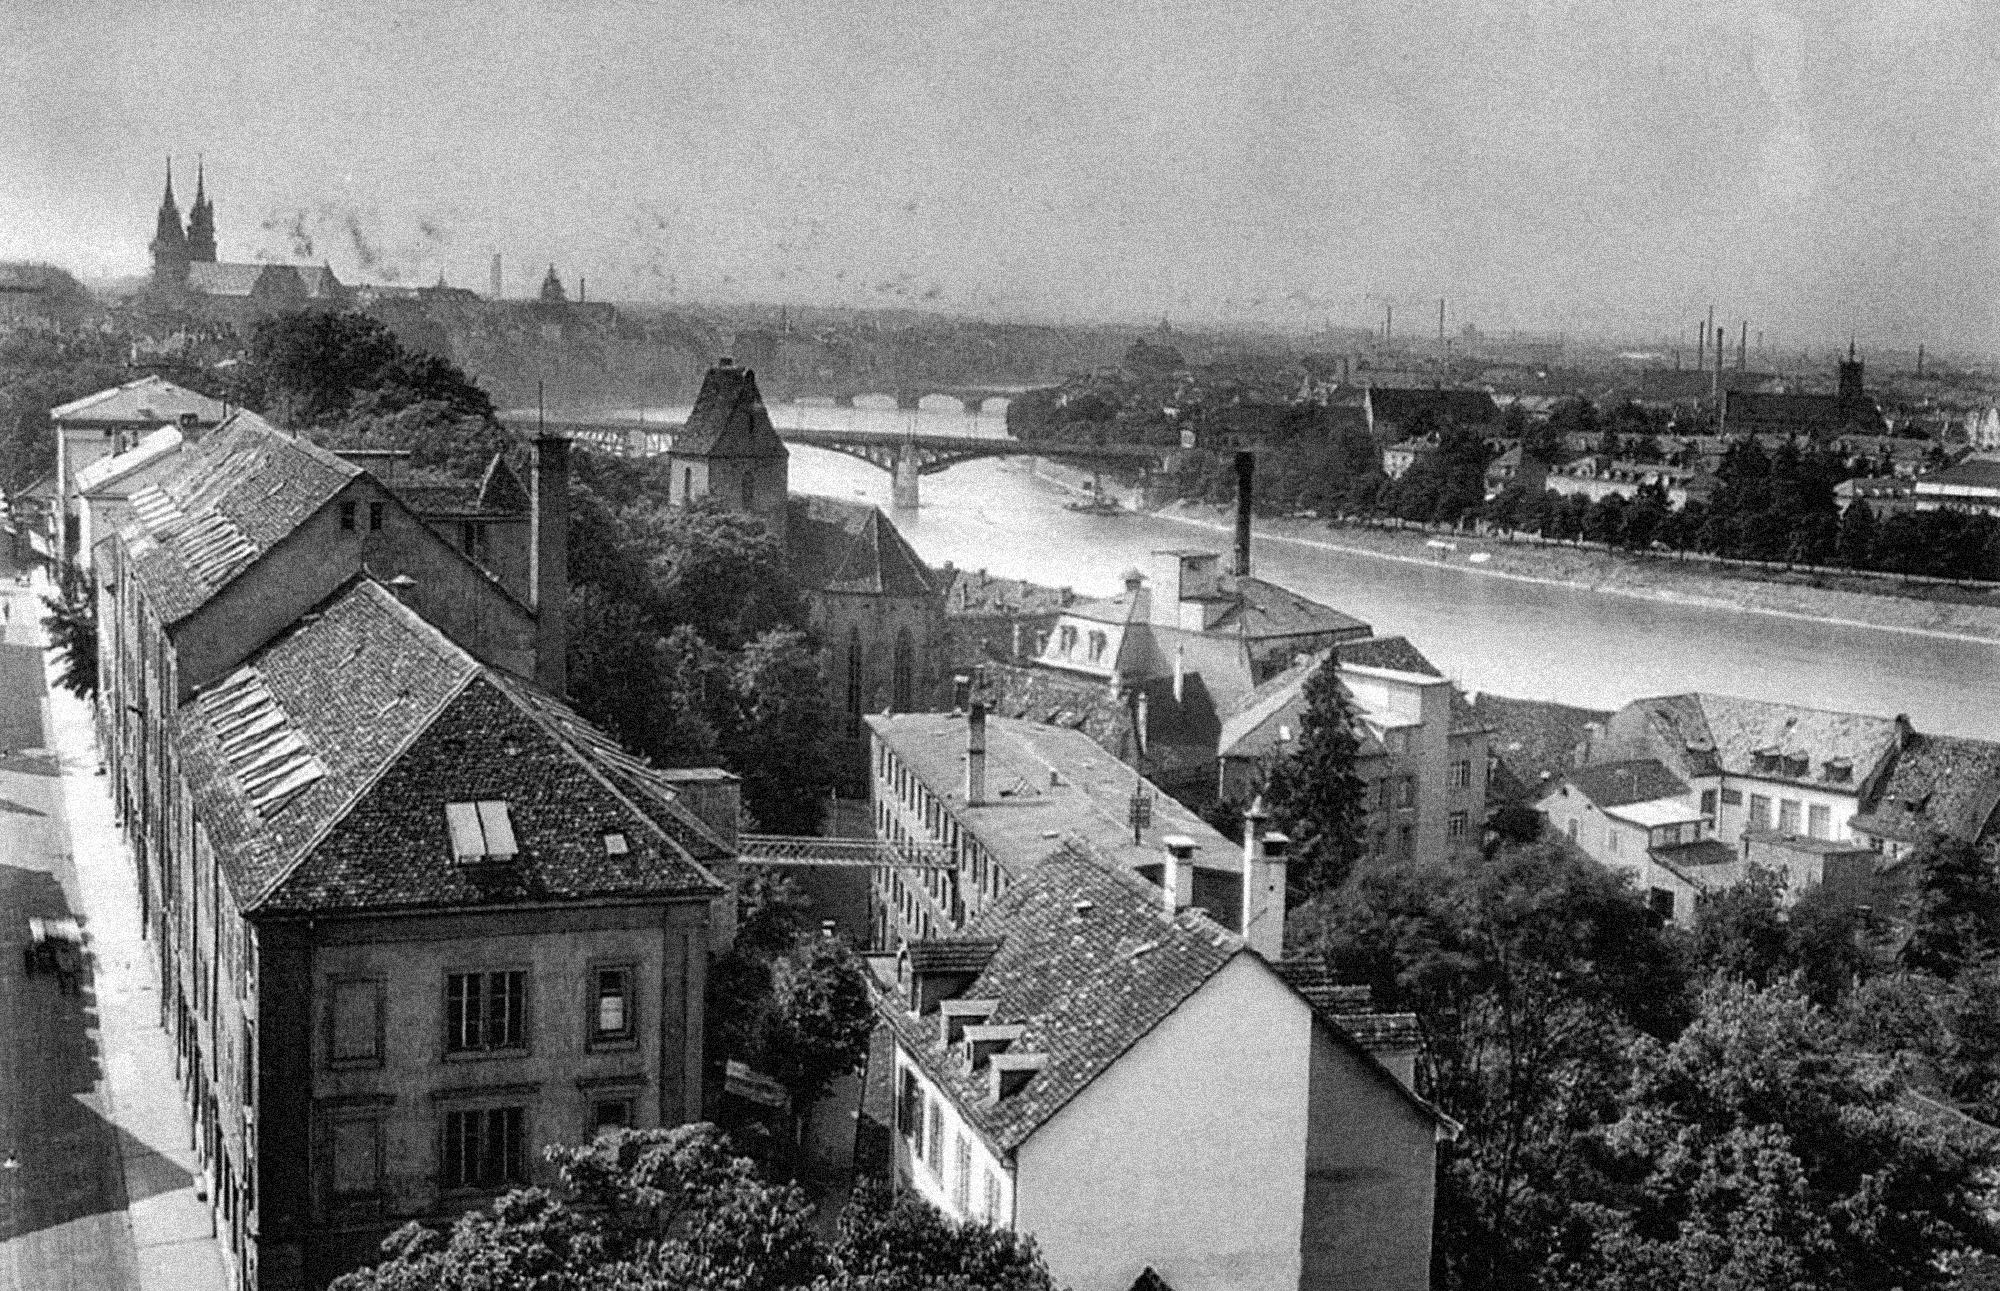 Jugendherberge St. Alban